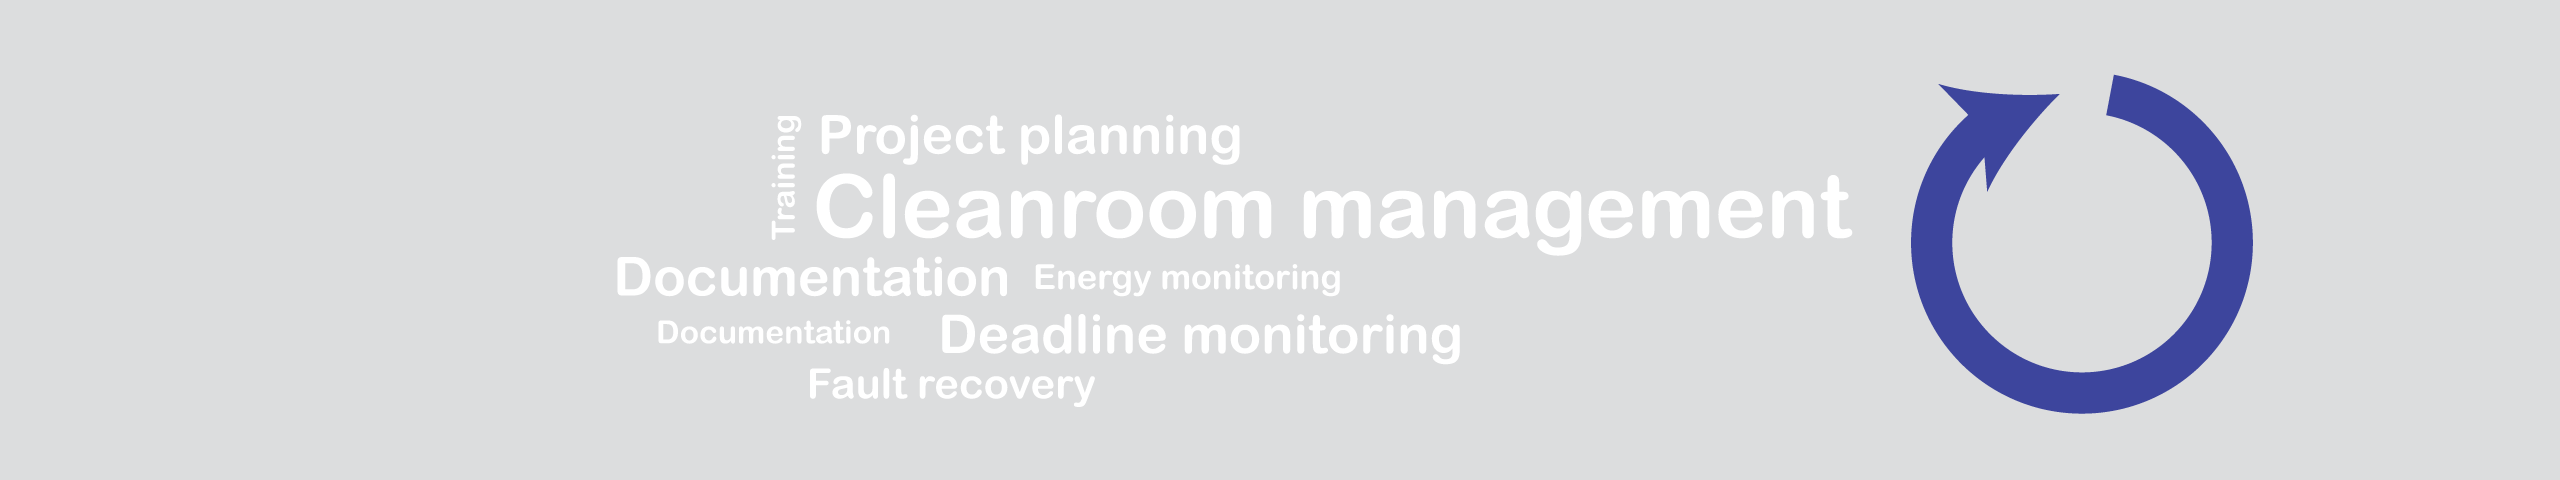 Cleanroom-Management